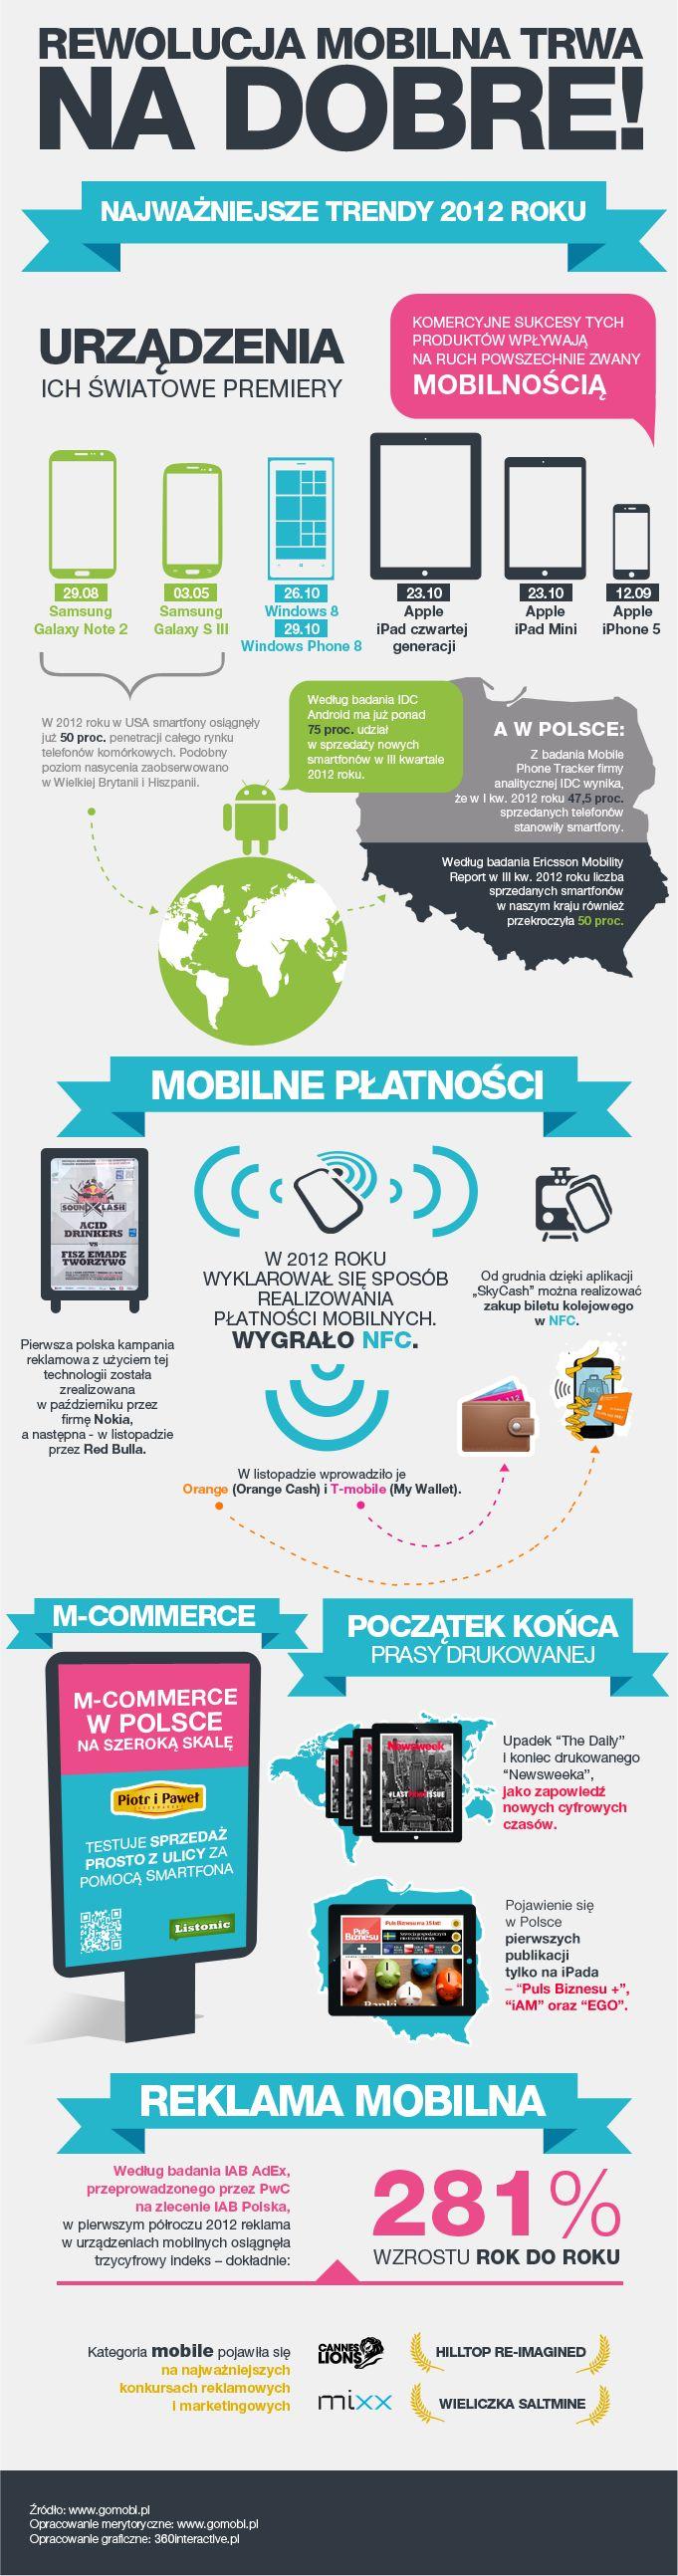 http://360interactive.pl/#/infografiki